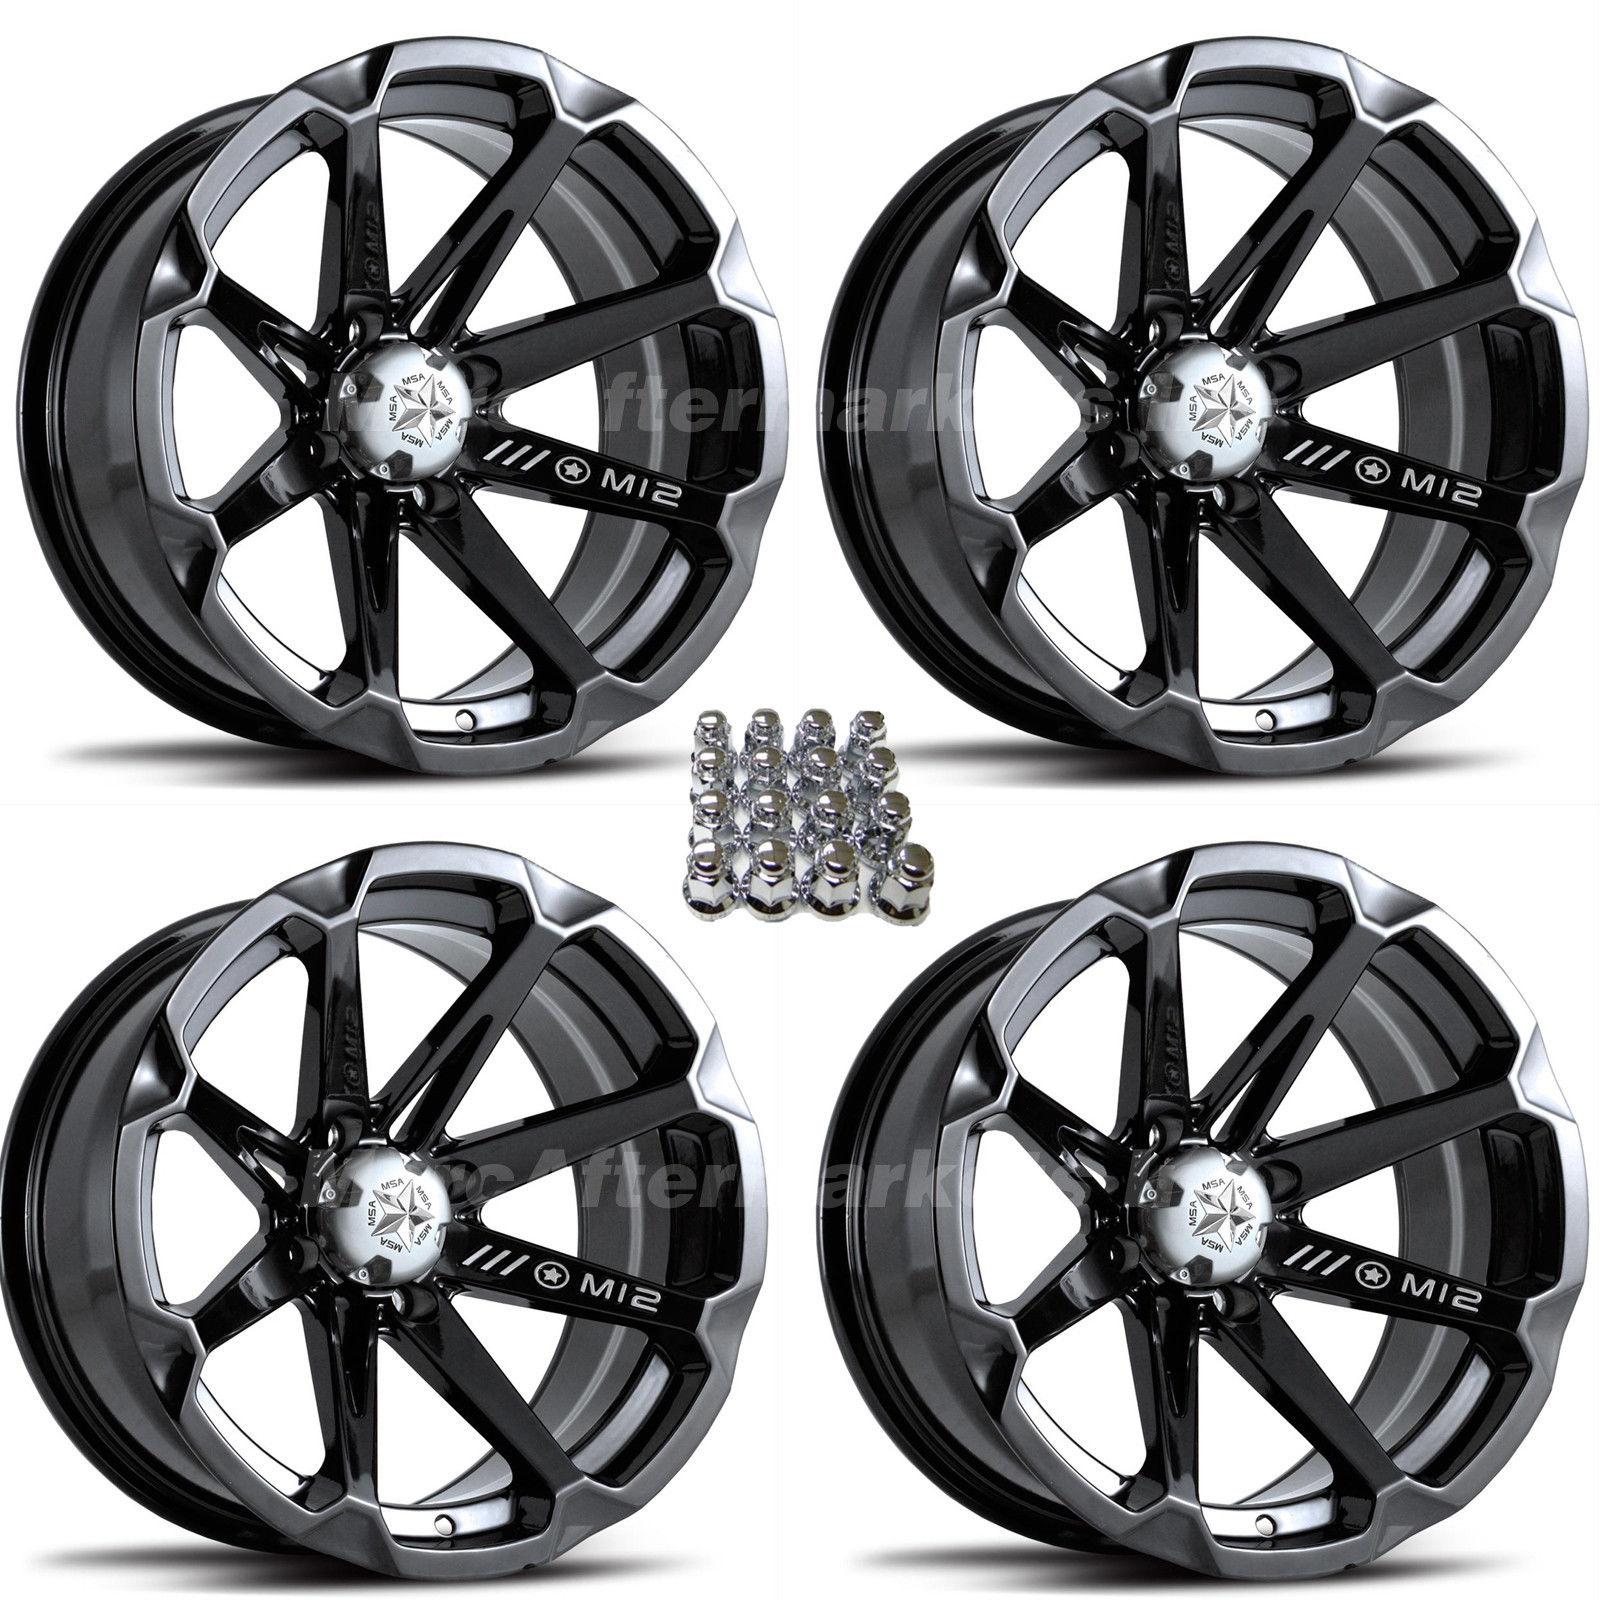 hight resolution of details about msa m12 diesel 14 atv wheels for sportsman xp scrambler 4